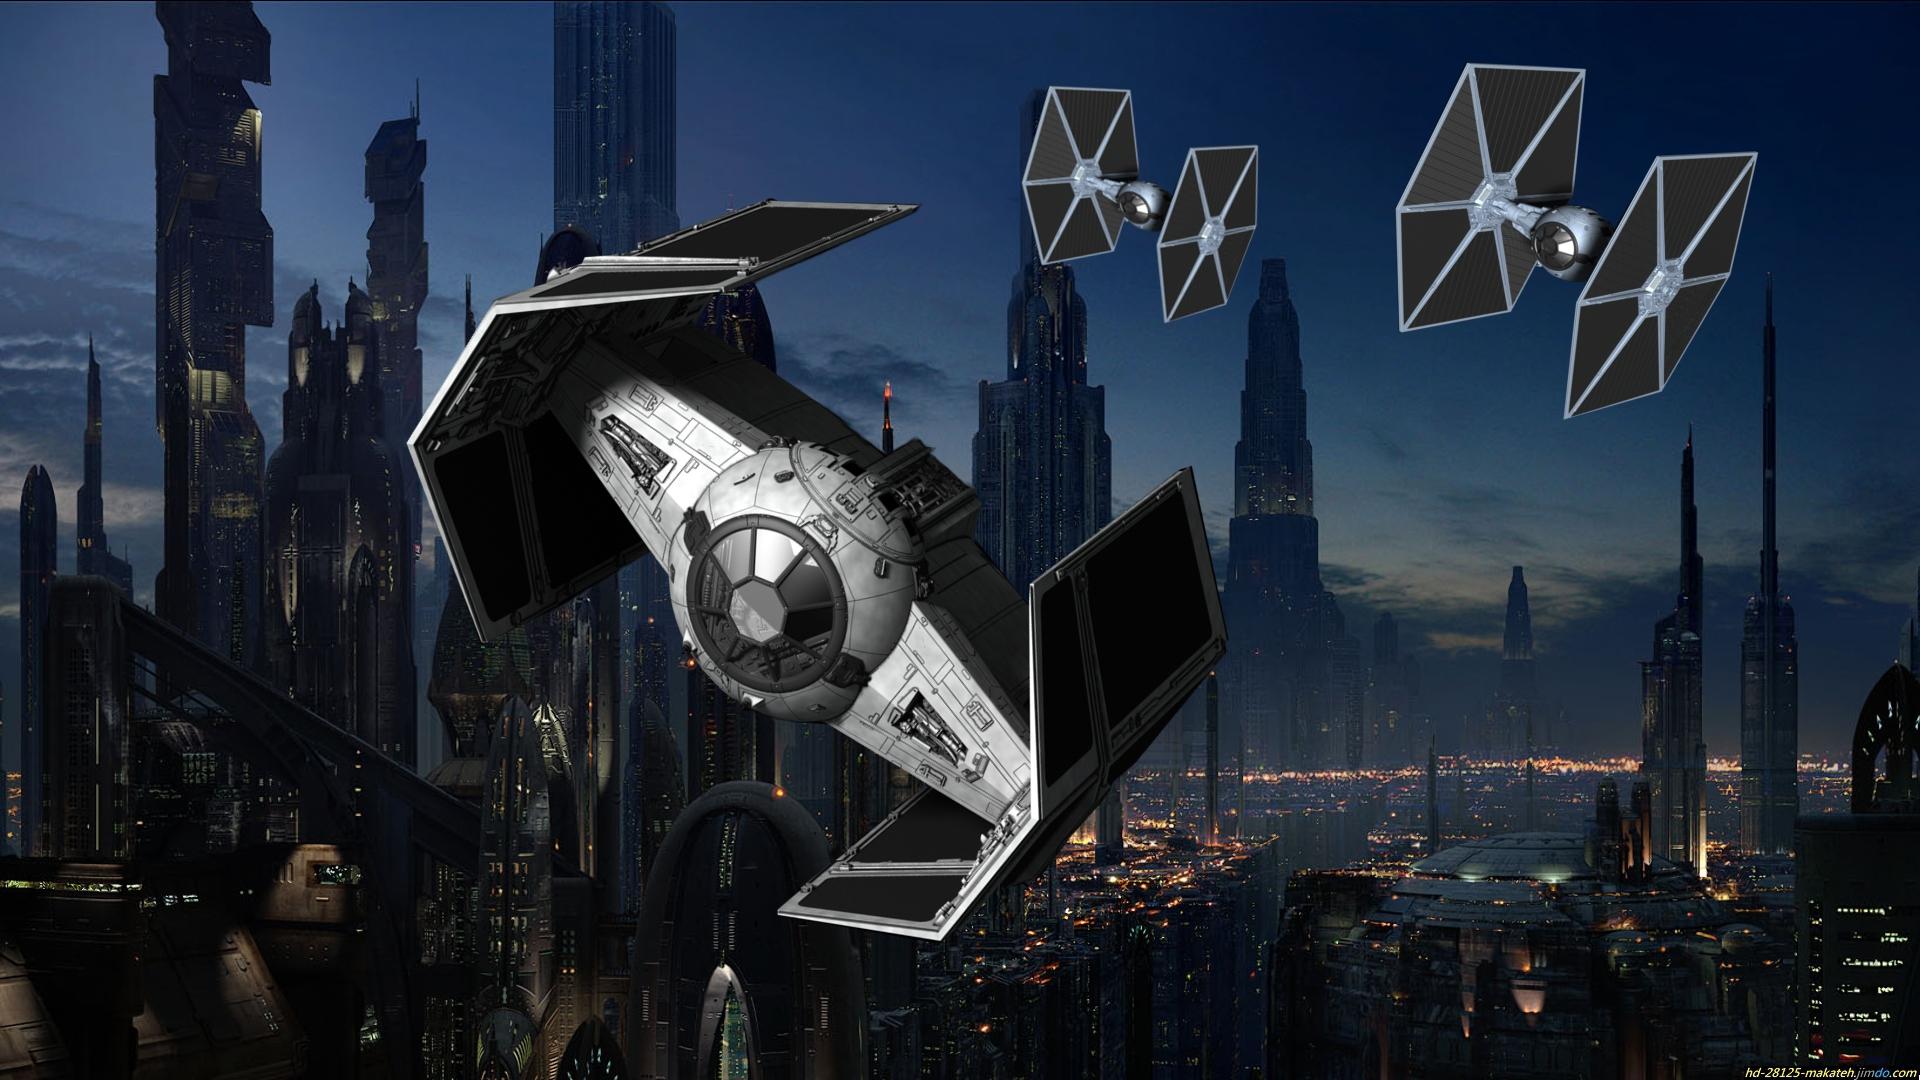 X Wing Fighter Iphone Wallpaper Star Wars Fondo De Pantalla Hd Fondo De Escritorio